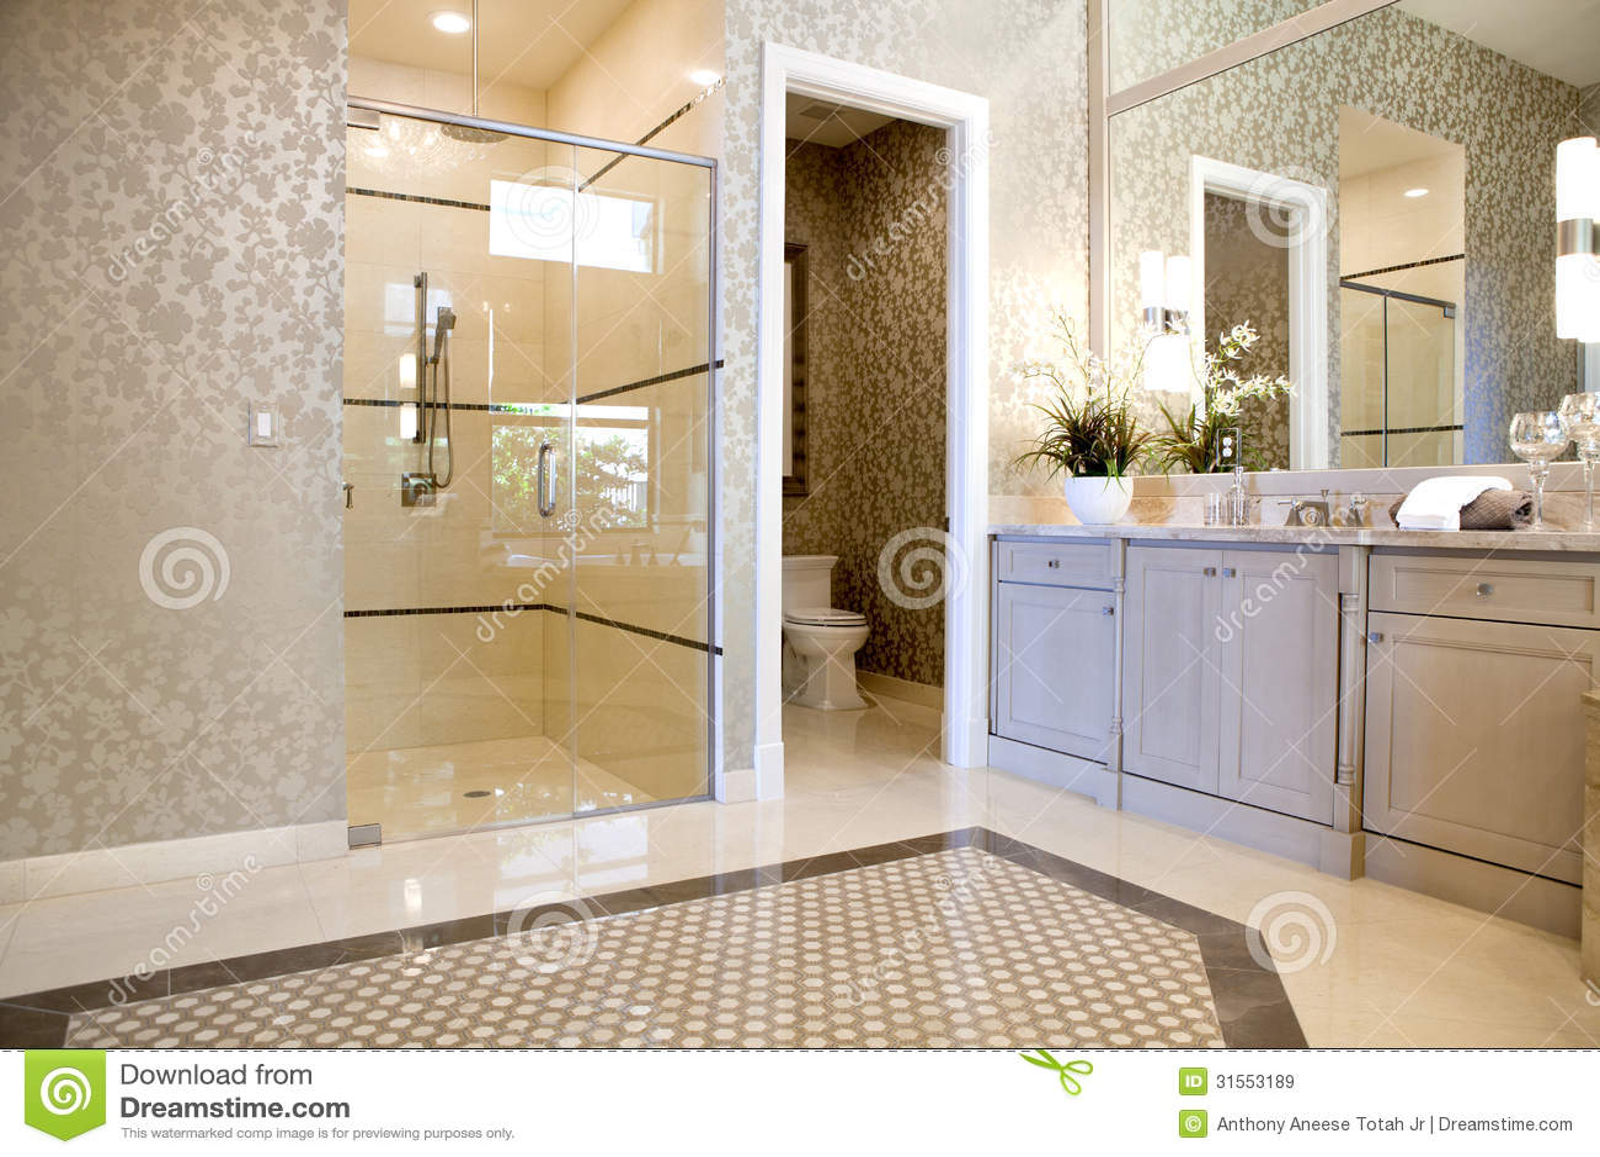 Stort exklusivt ledar  badrum royaltyfria bilder   bild: 31553189